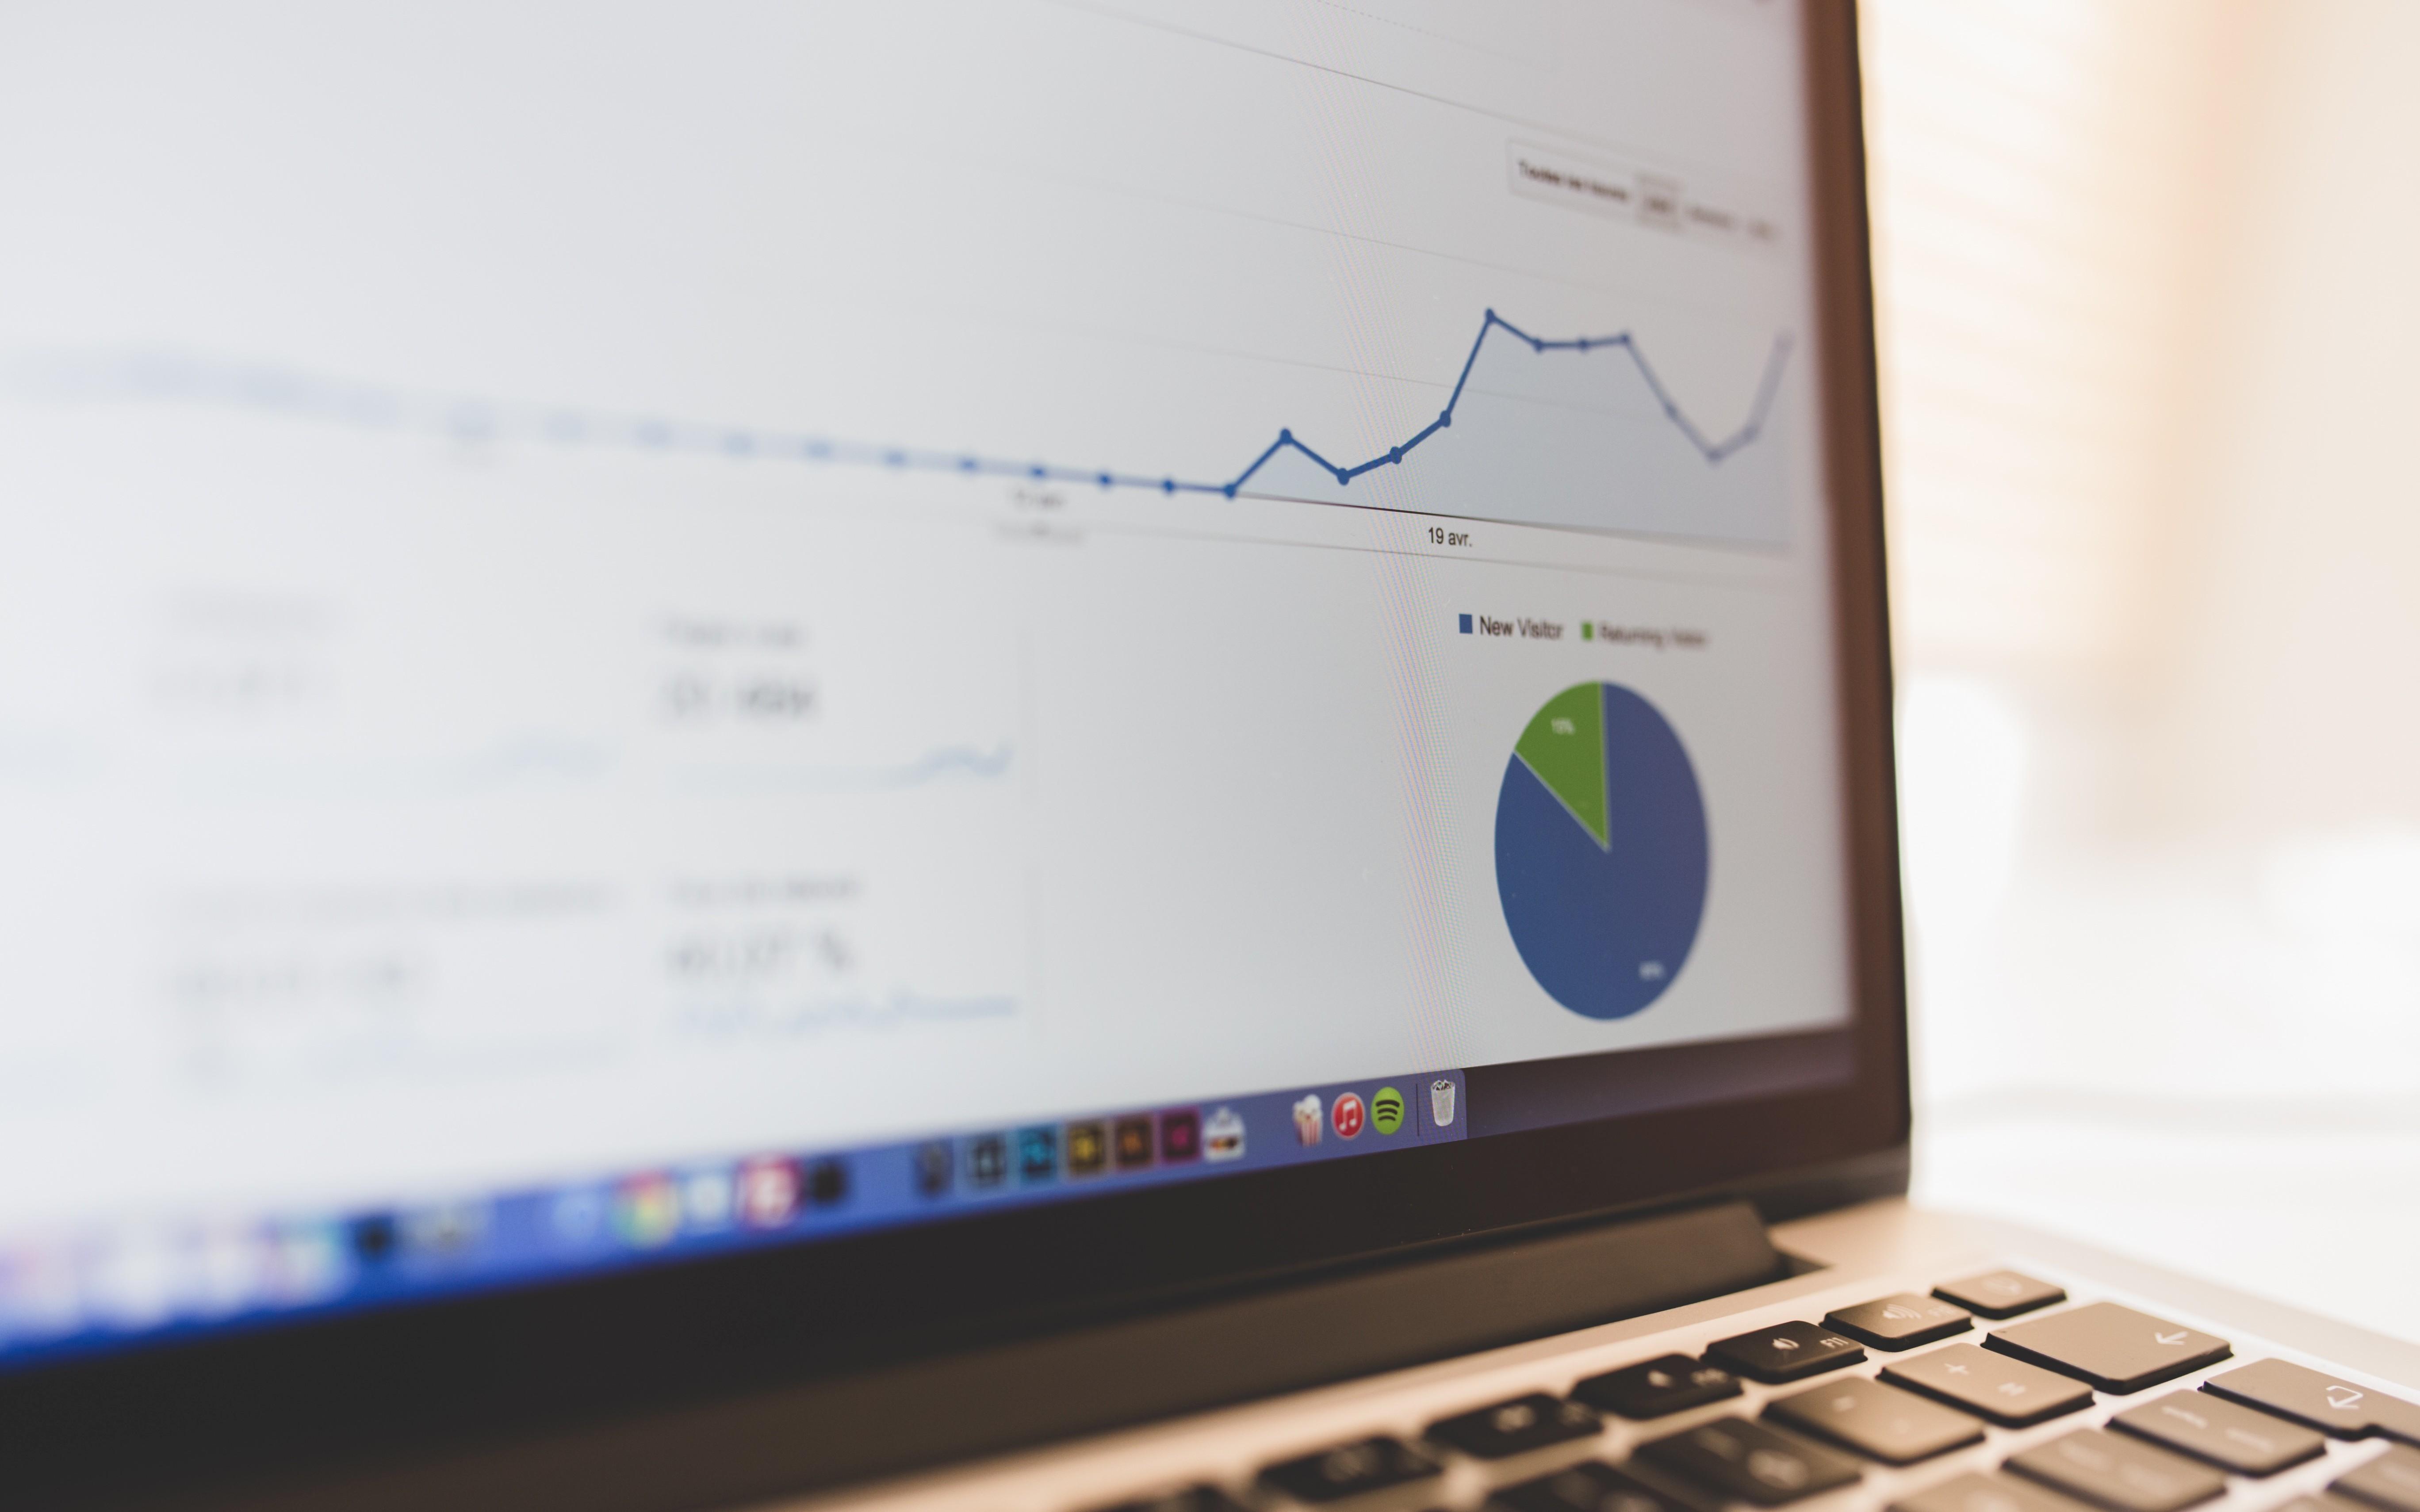 Using Grafana on Top of Elasticsearch - DZone Big Data